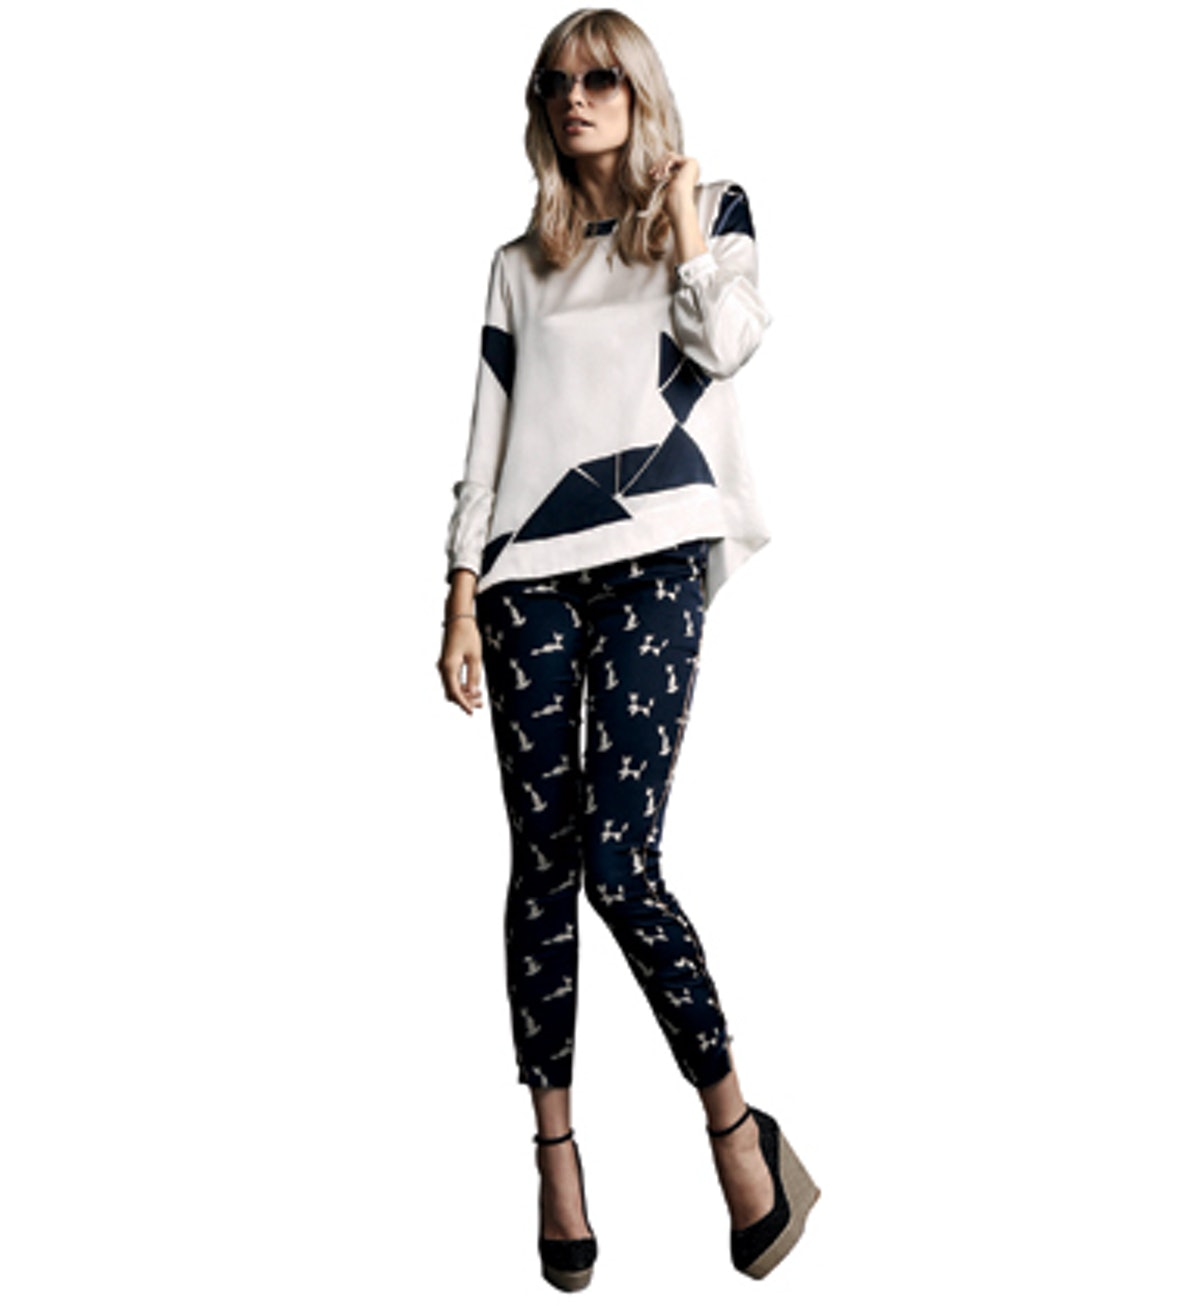 blog-loungewear-karla-01.jpg